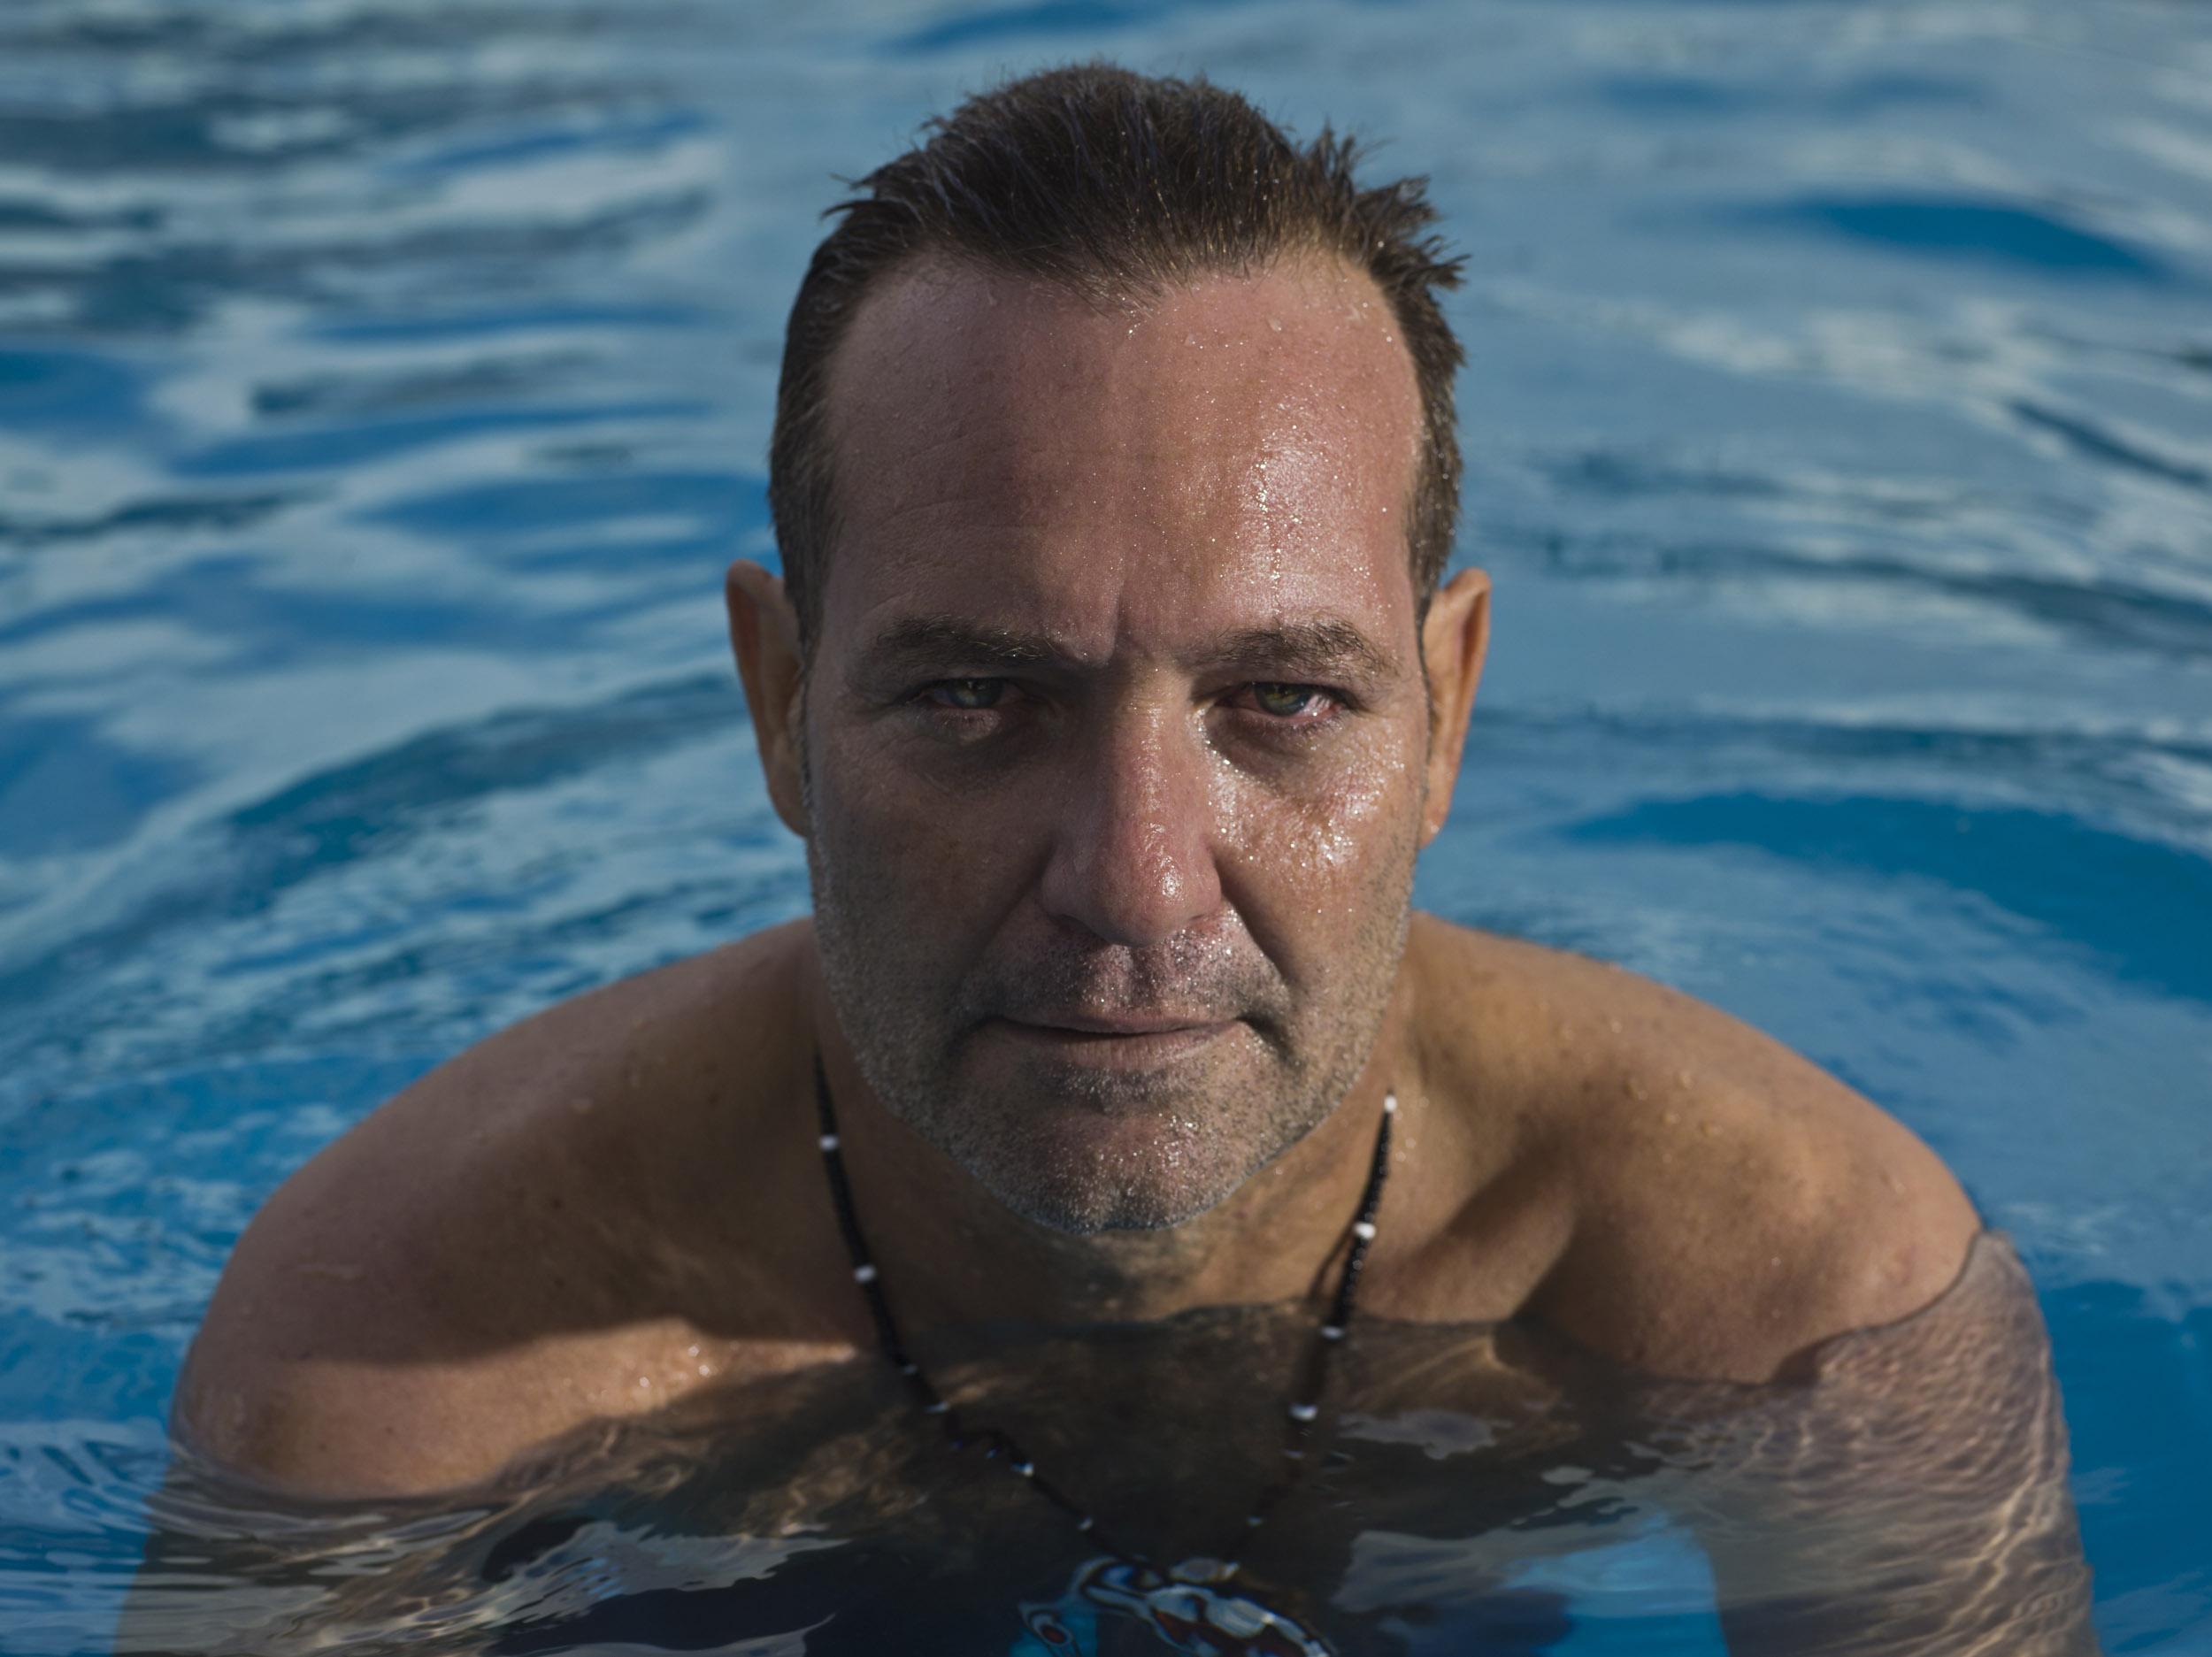 Jorge Perugorría, actor - Illuminated Cuba - Hector Garrido, Aerial and human photography